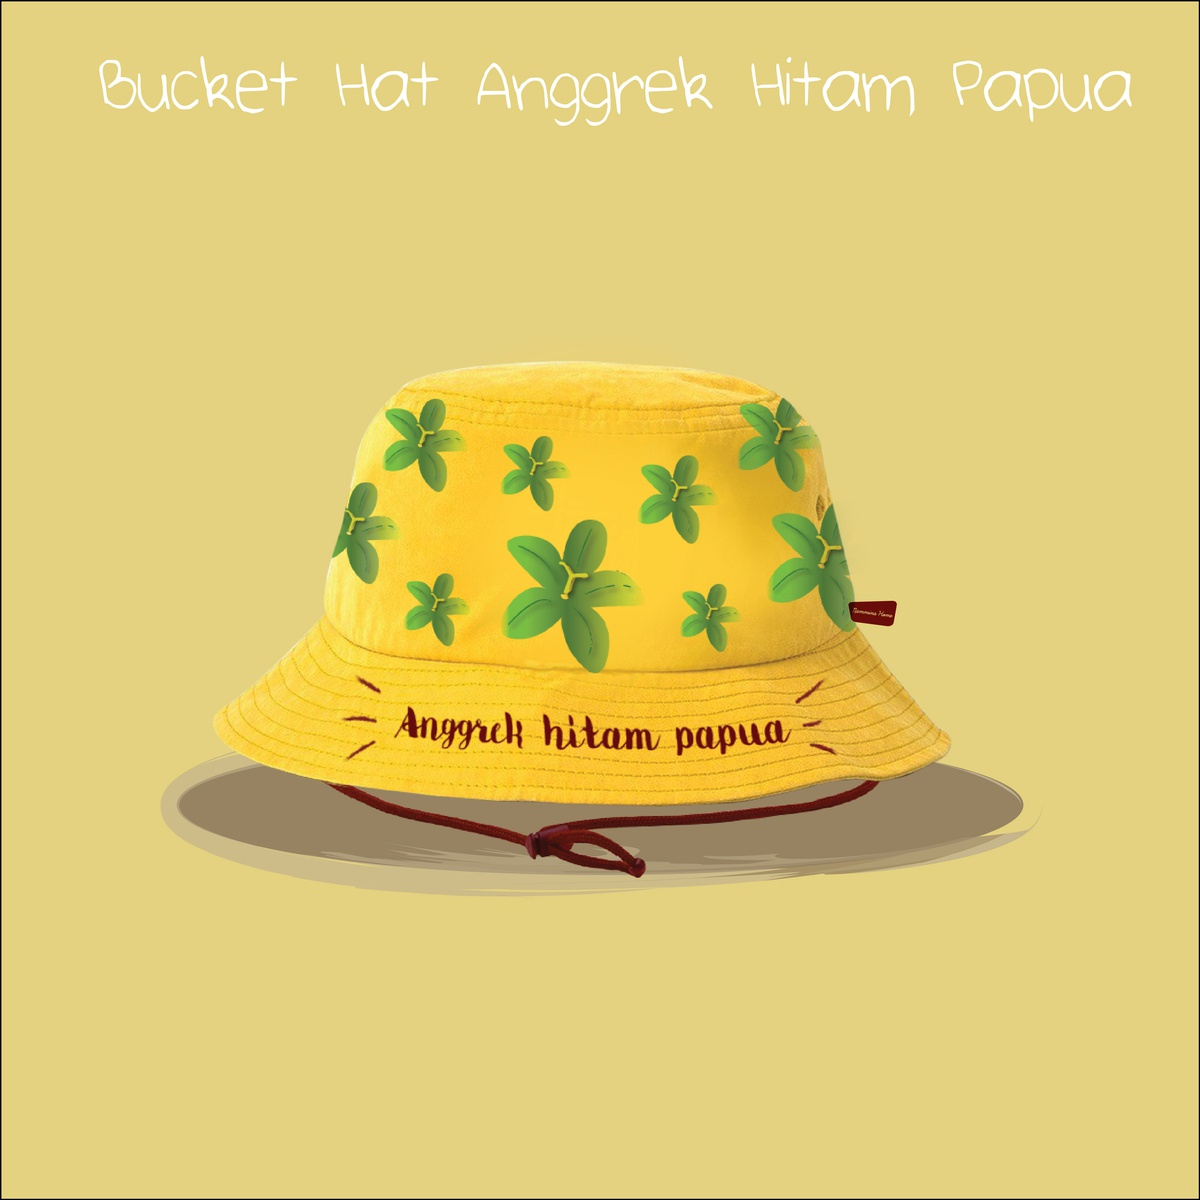 Anggrek Hitam Papua Harga godean.web.id